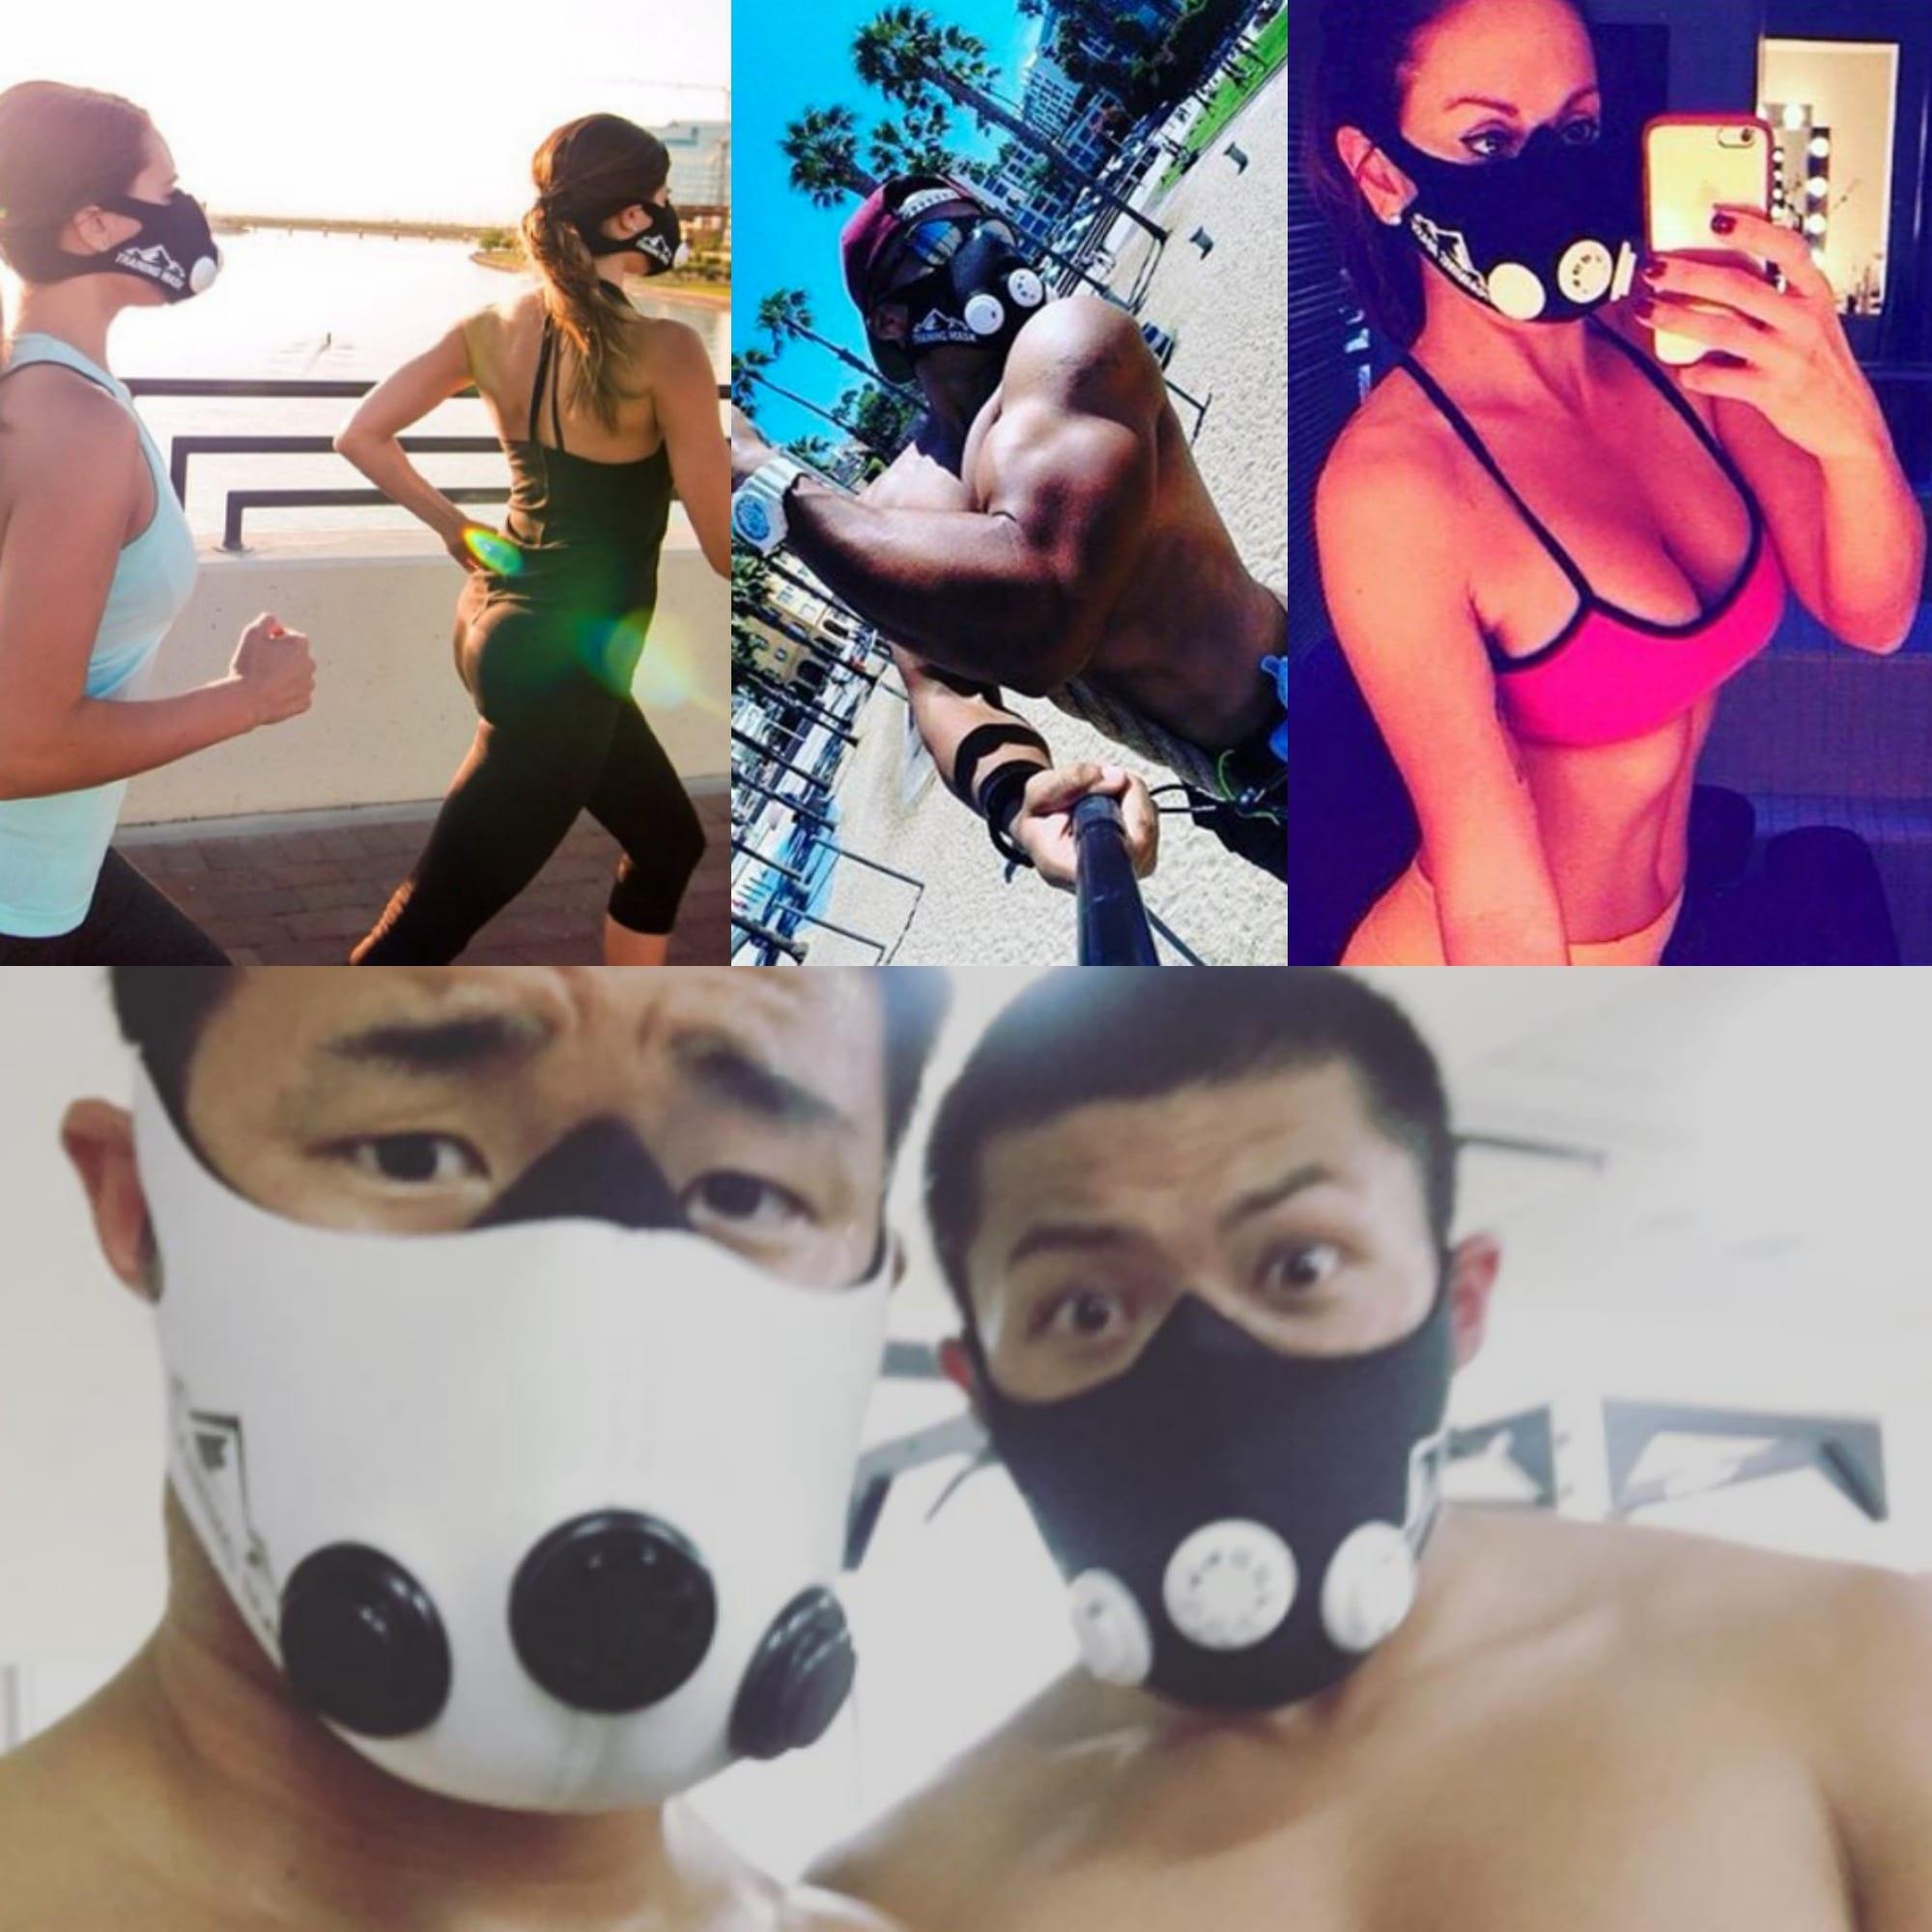 Training Mask Podcast Collage